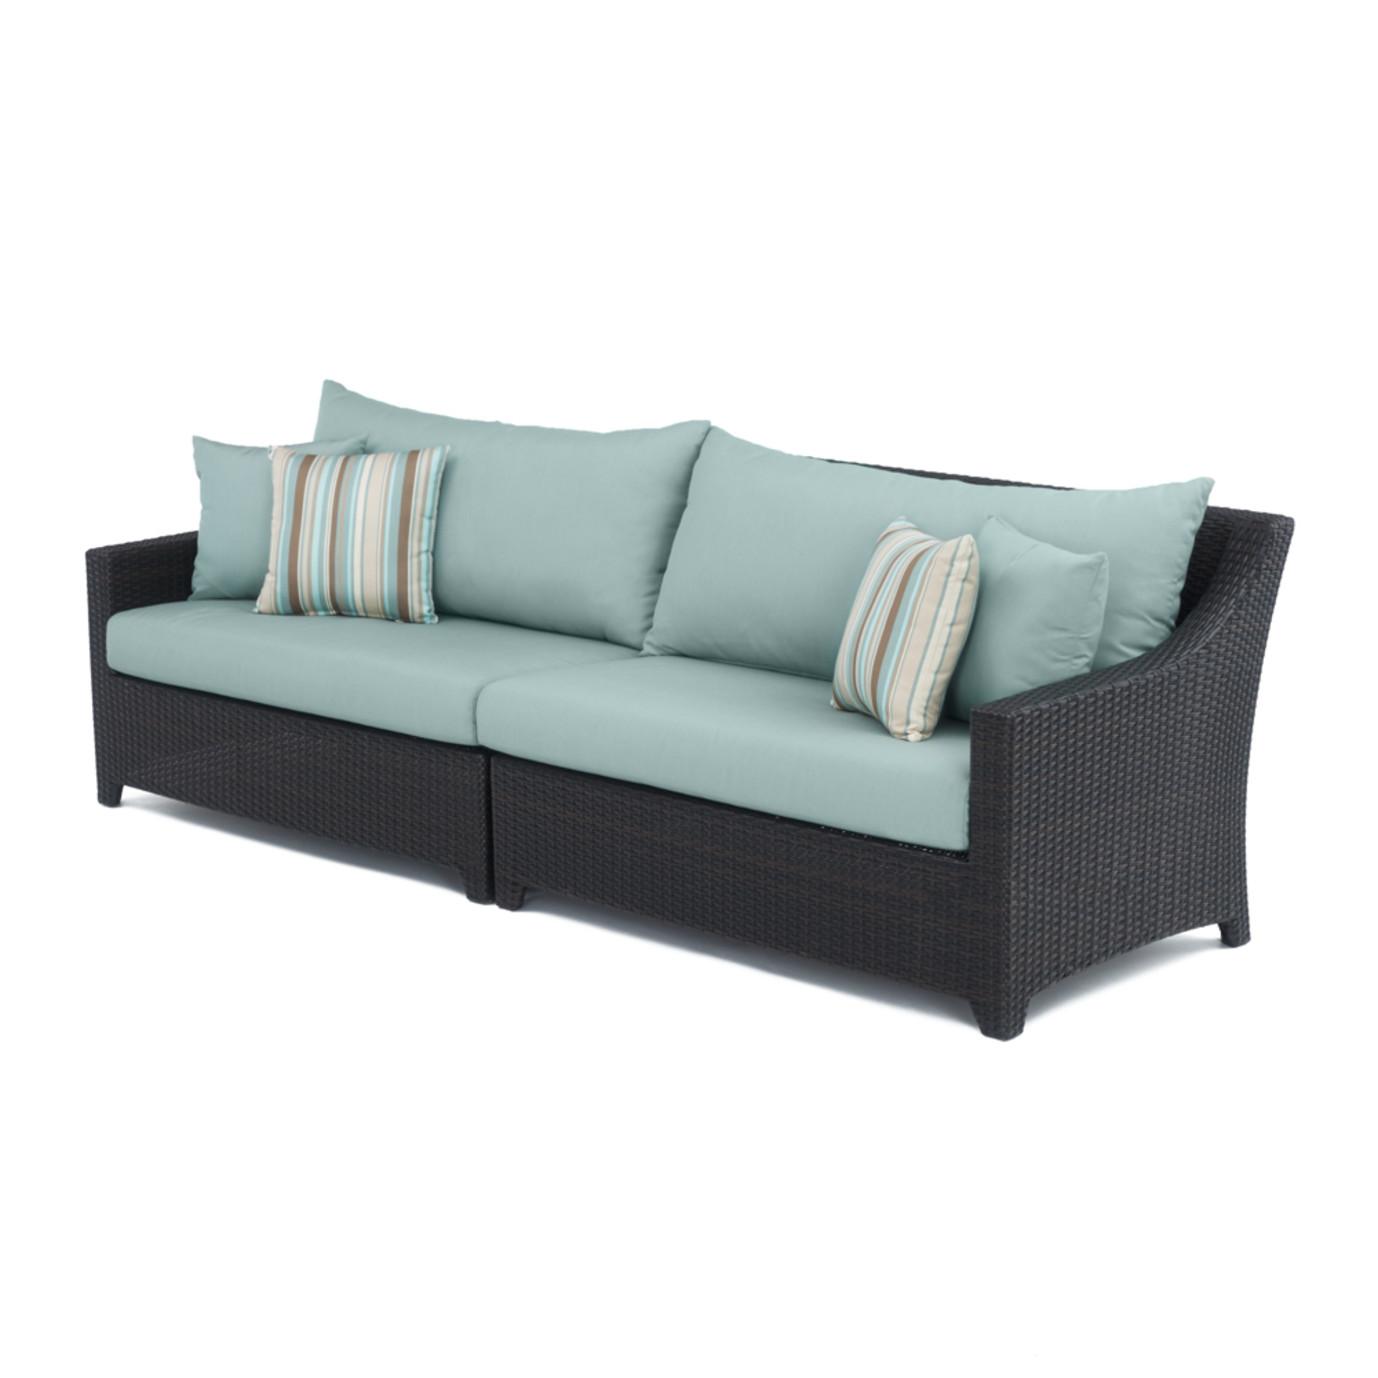 Deco™ Sofa - Bliss Blue